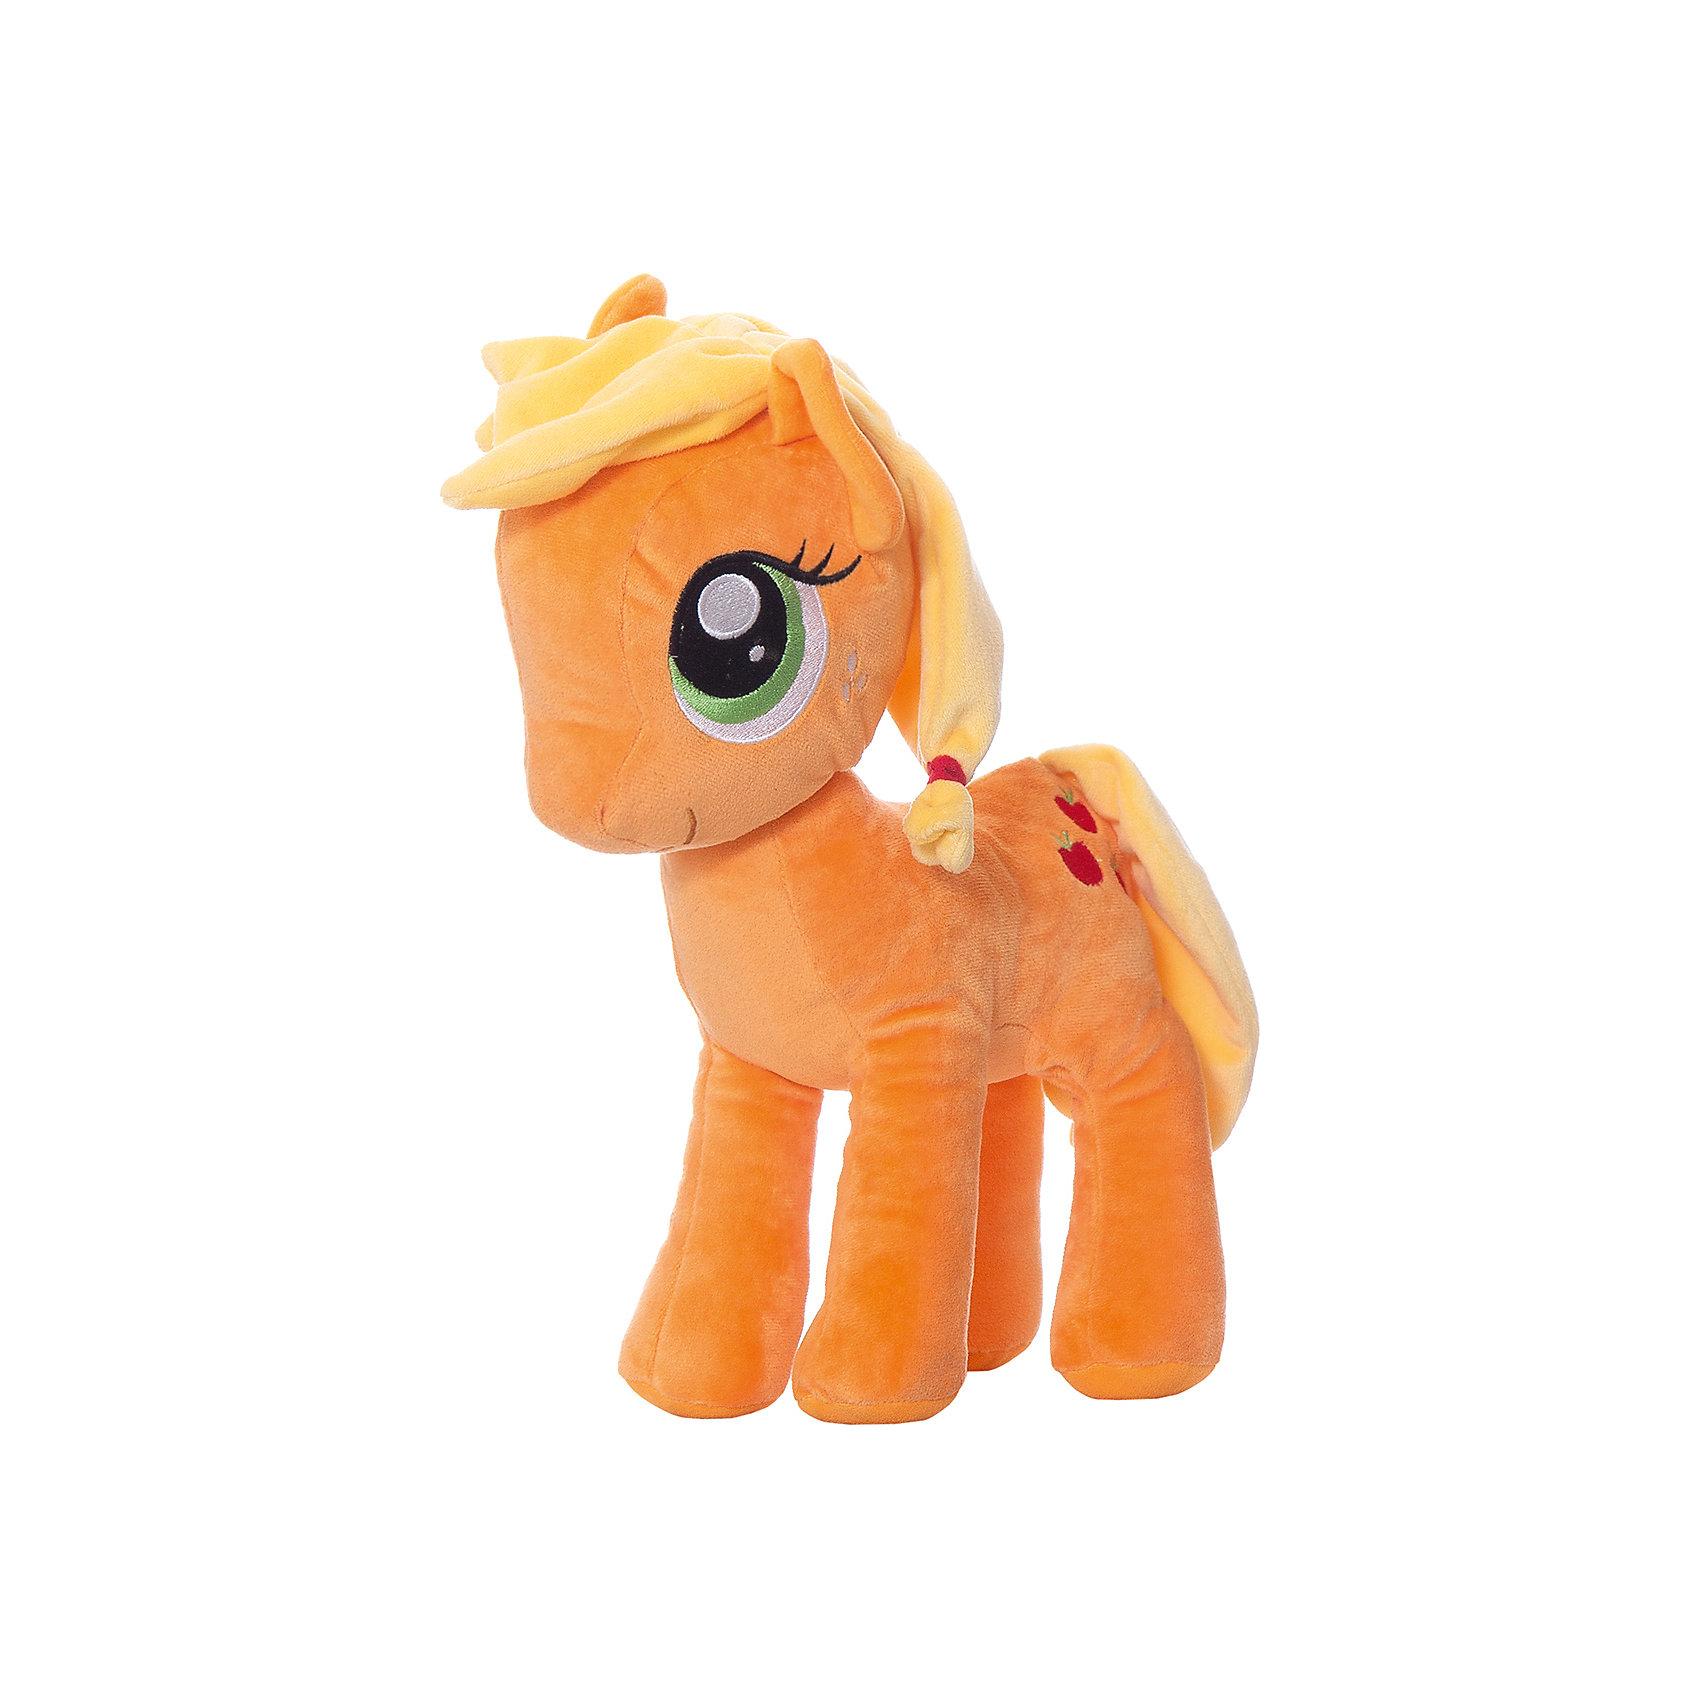 Плюшевые пони, B9817/C0118, My little Pony, HasbroЛюбимые герои<br><br><br>Ширина мм: 89<br>Глубина мм: 203<br>Высота мм: 305<br>Вес г: 259<br>Возраст от месяцев: 36<br>Возраст до месяцев: 84<br>Пол: Женский<br>Возраст: Детский<br>SKU: 6861722